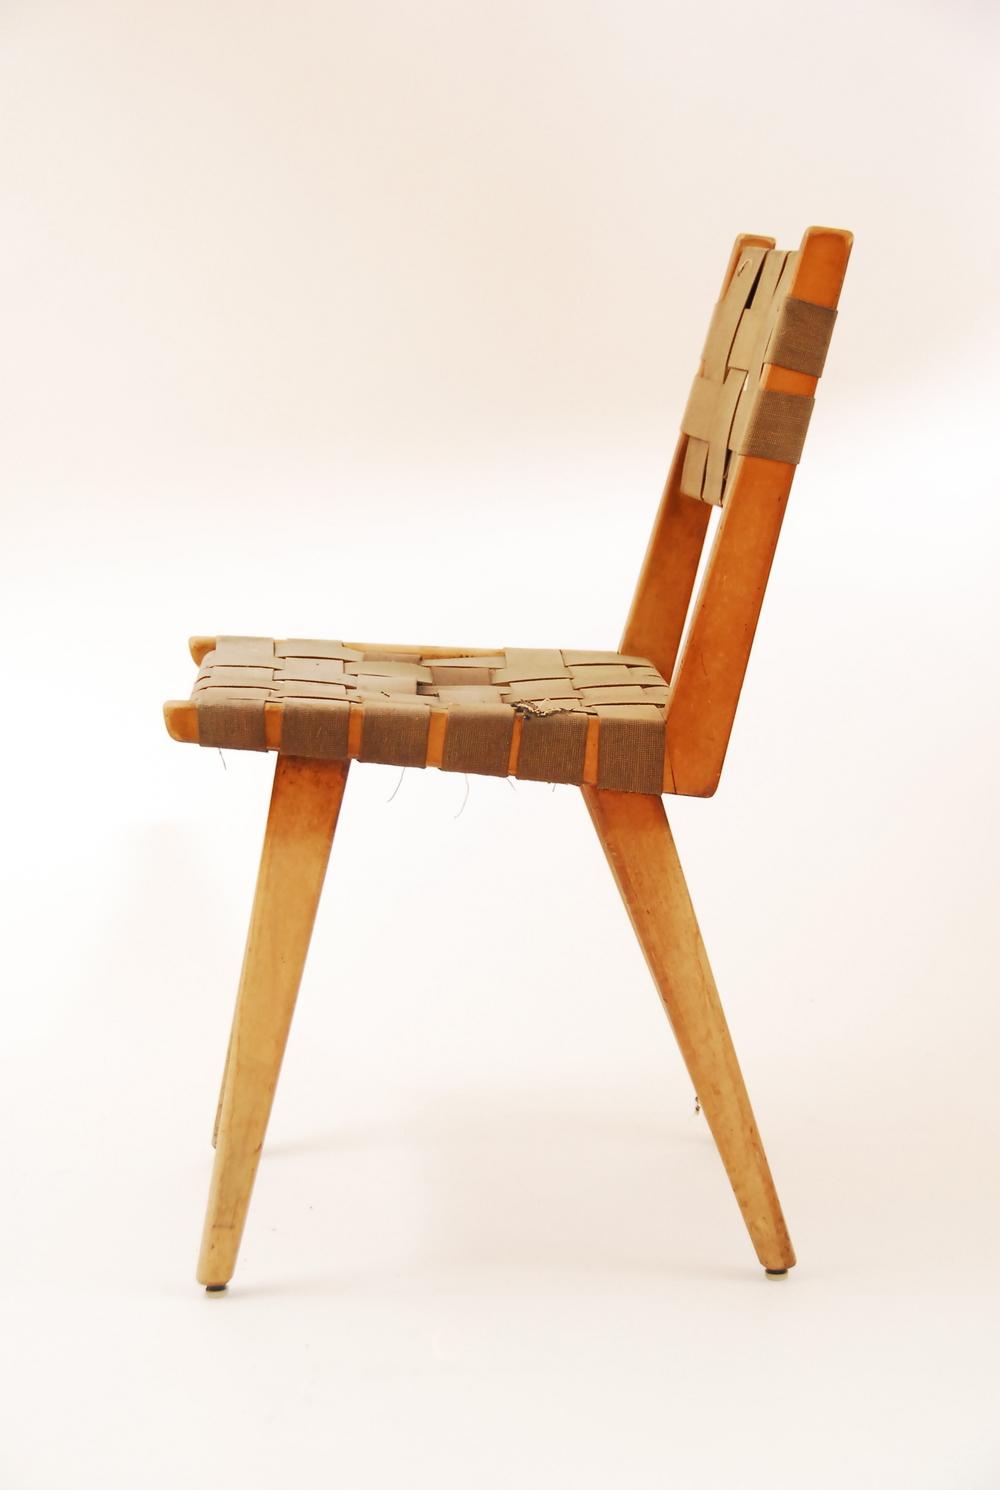 studio_nicco_chair__1340.JPG